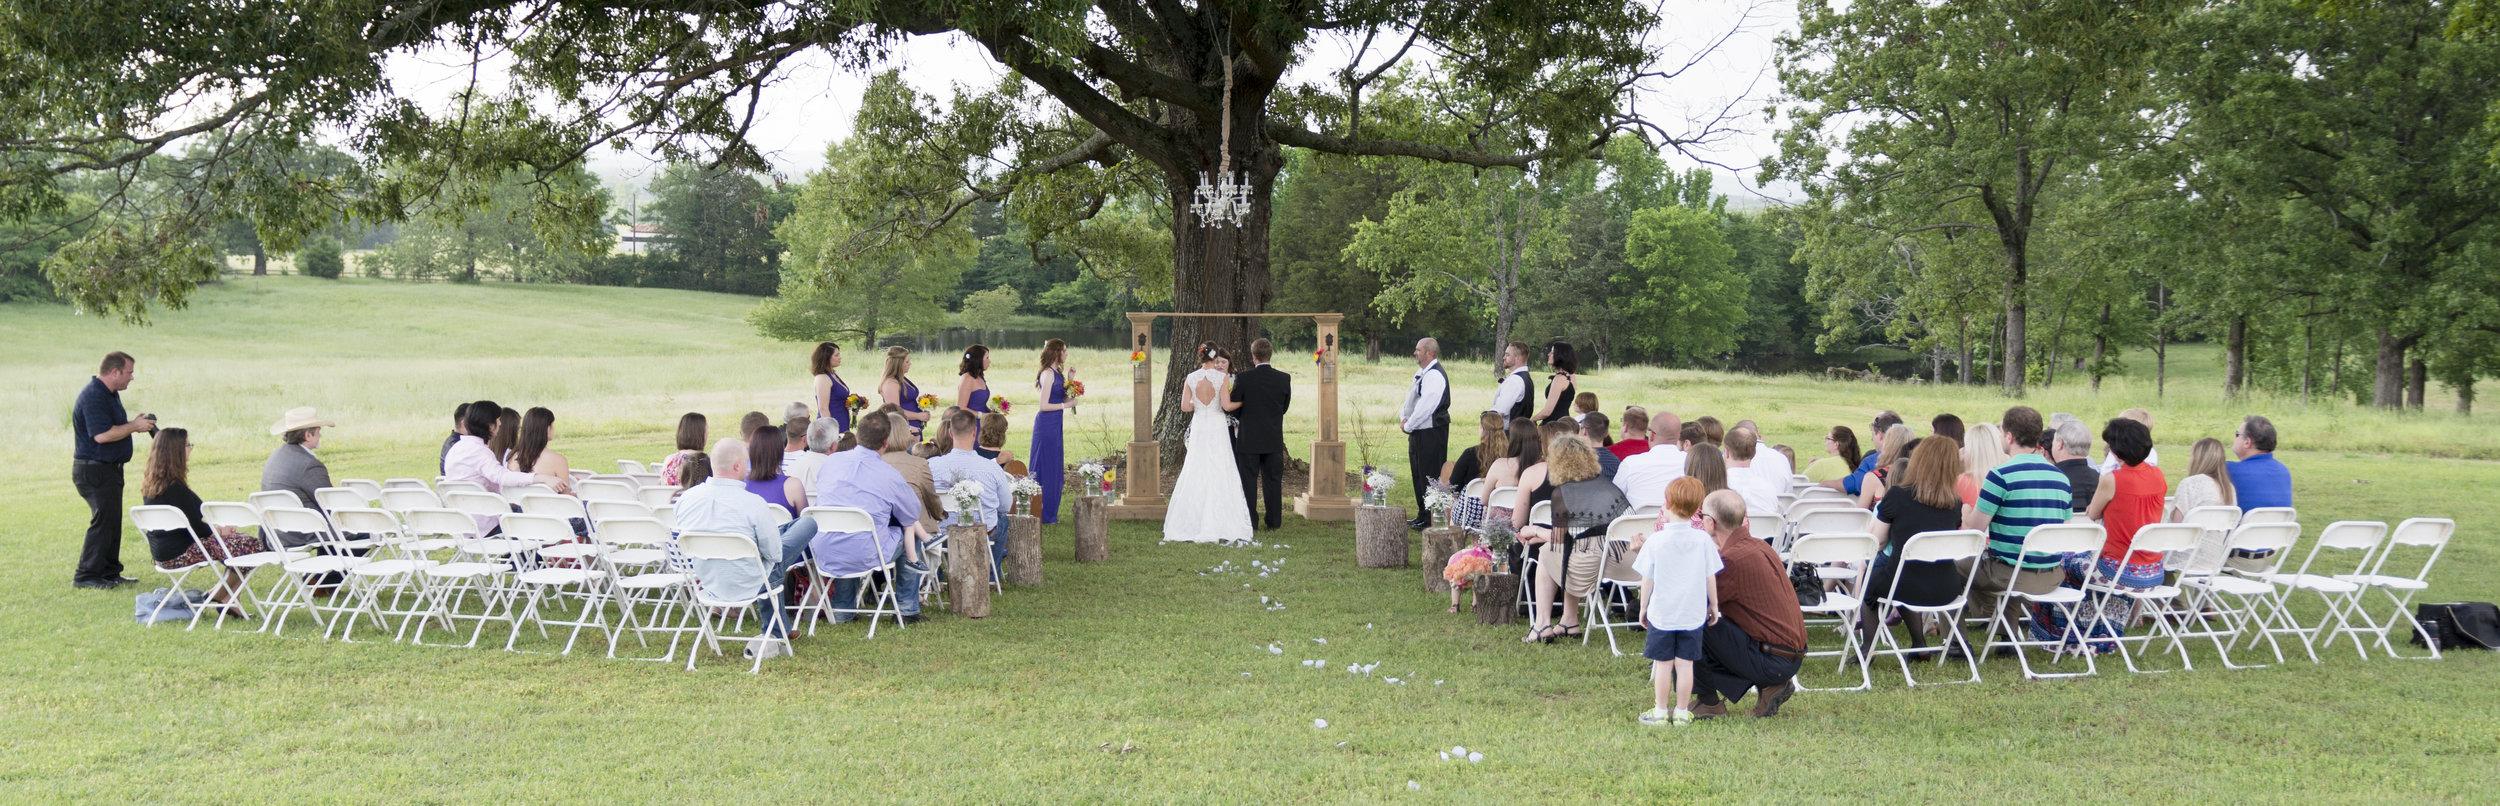 2015_05_16-Lum_Wedding__WSH7455__2015_Echo_Arkansas.jpg